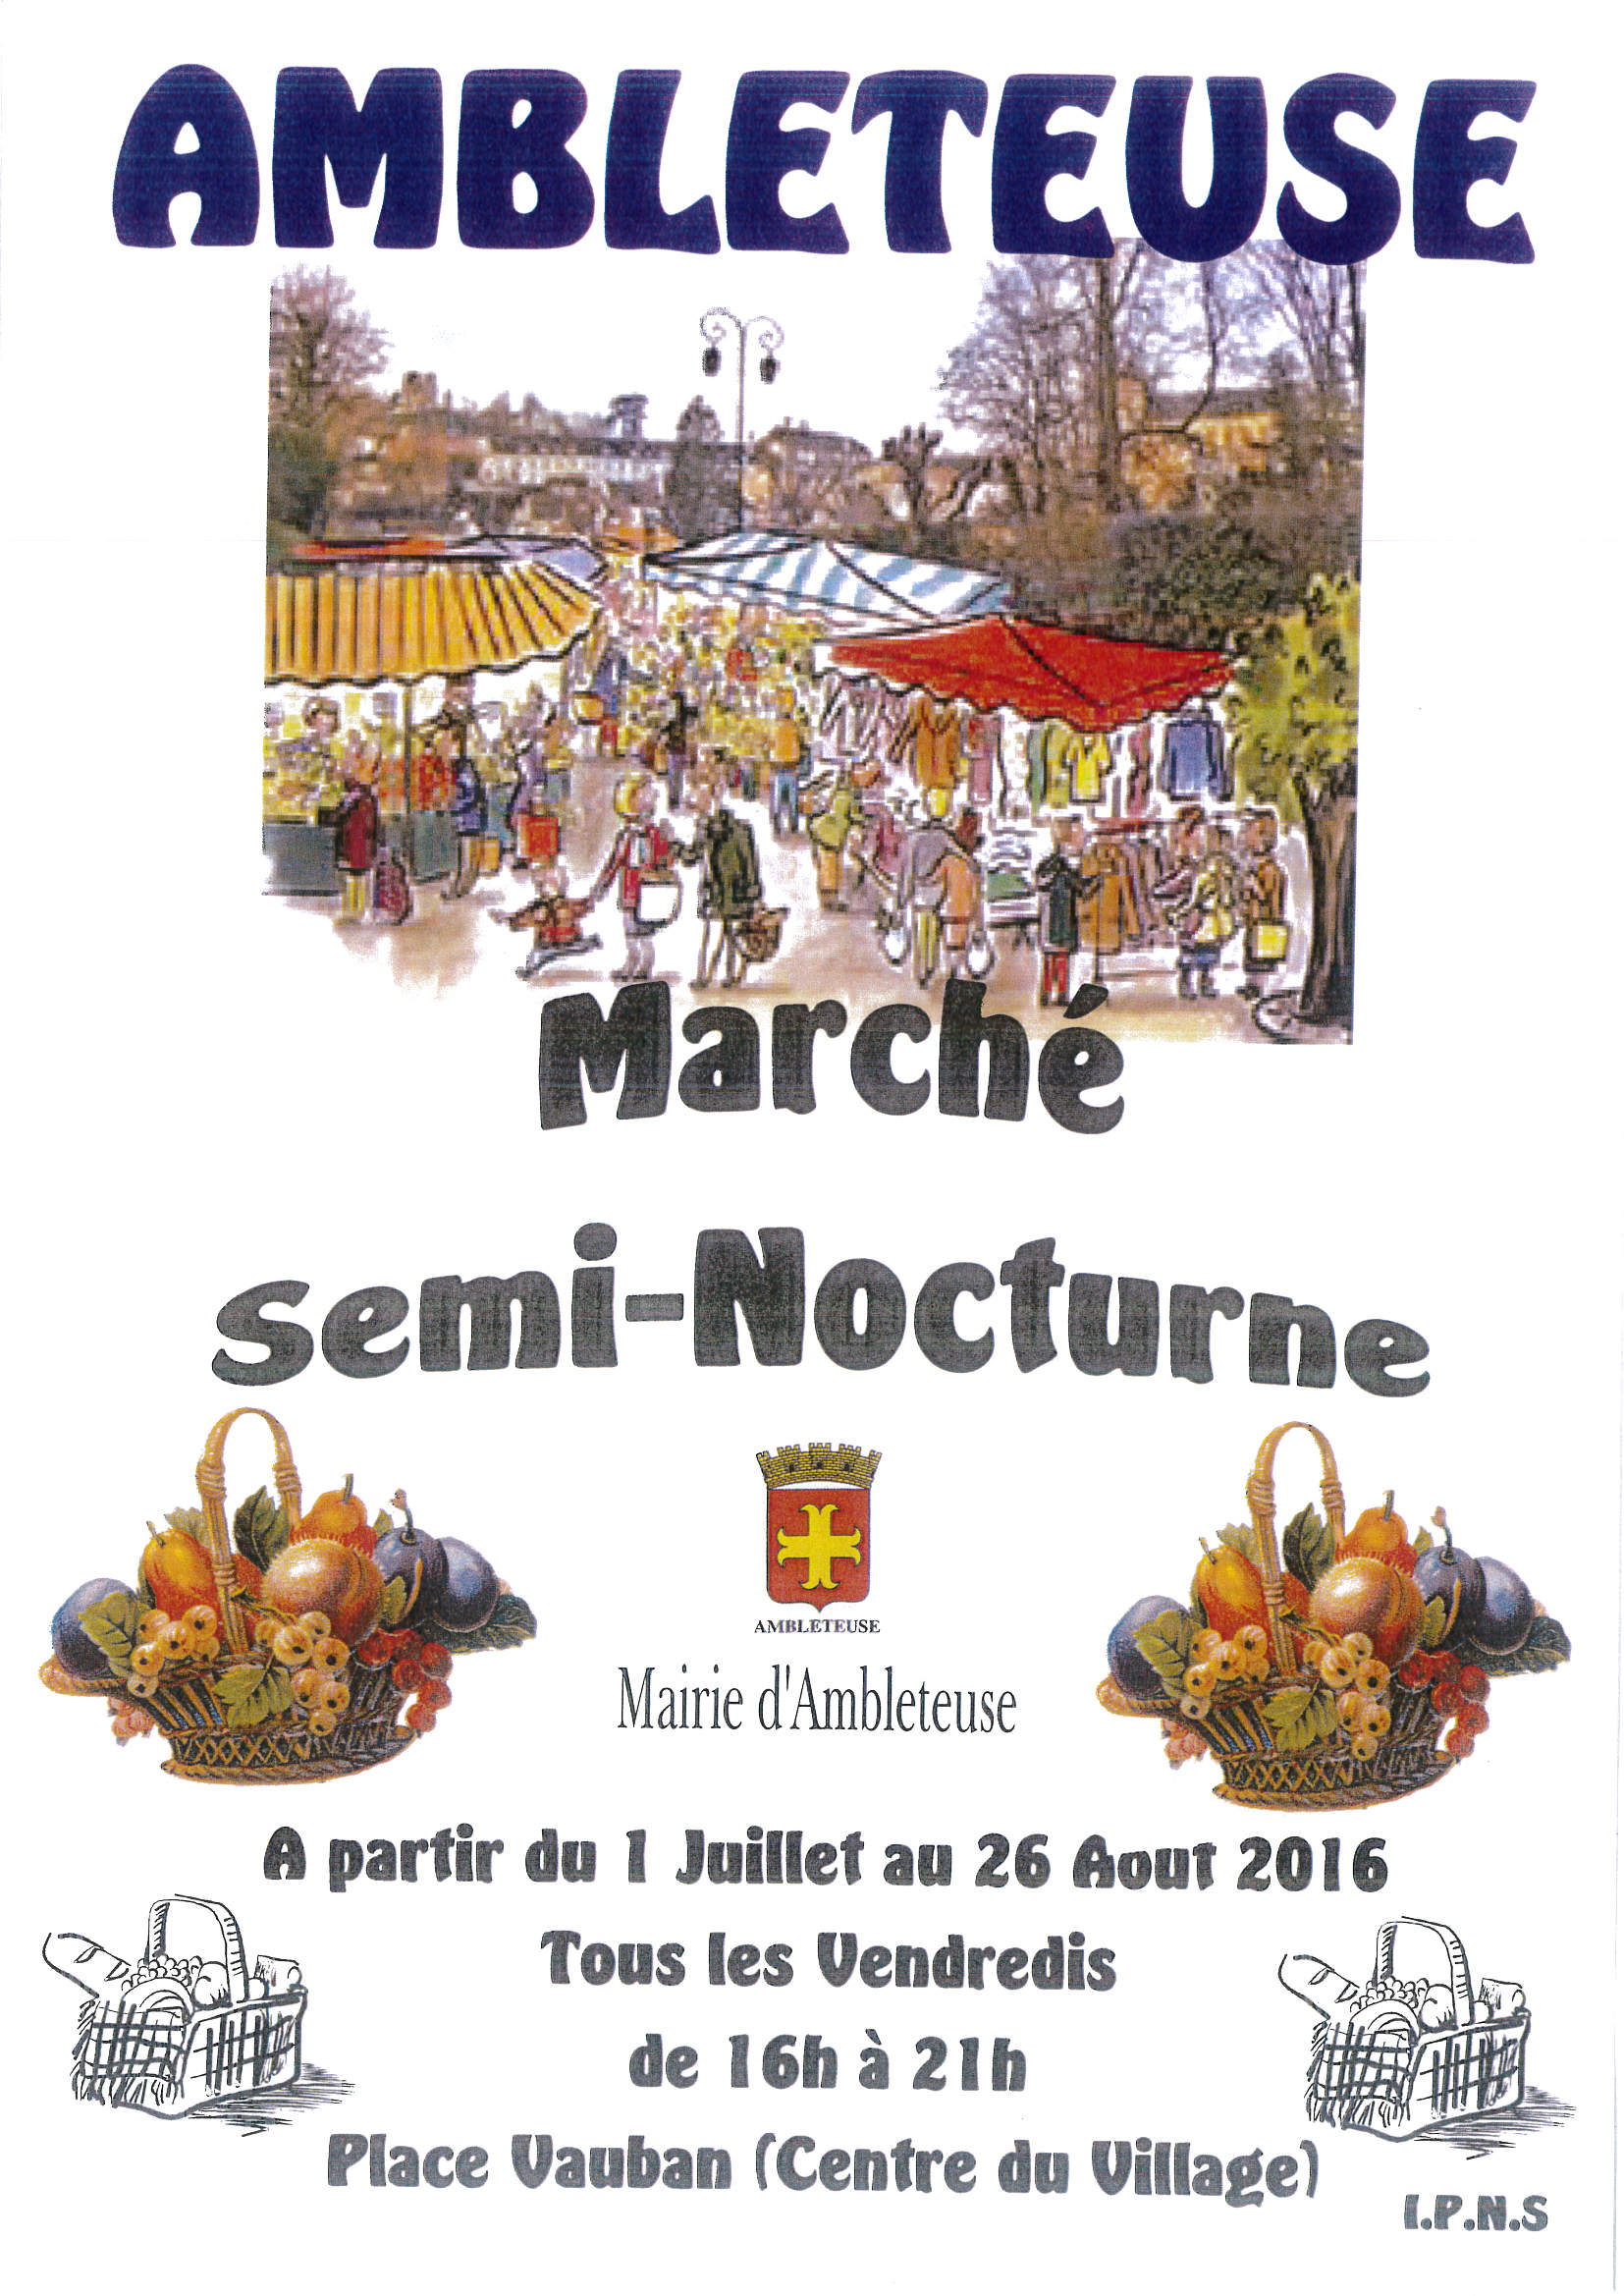 marche nocture_001.jpg